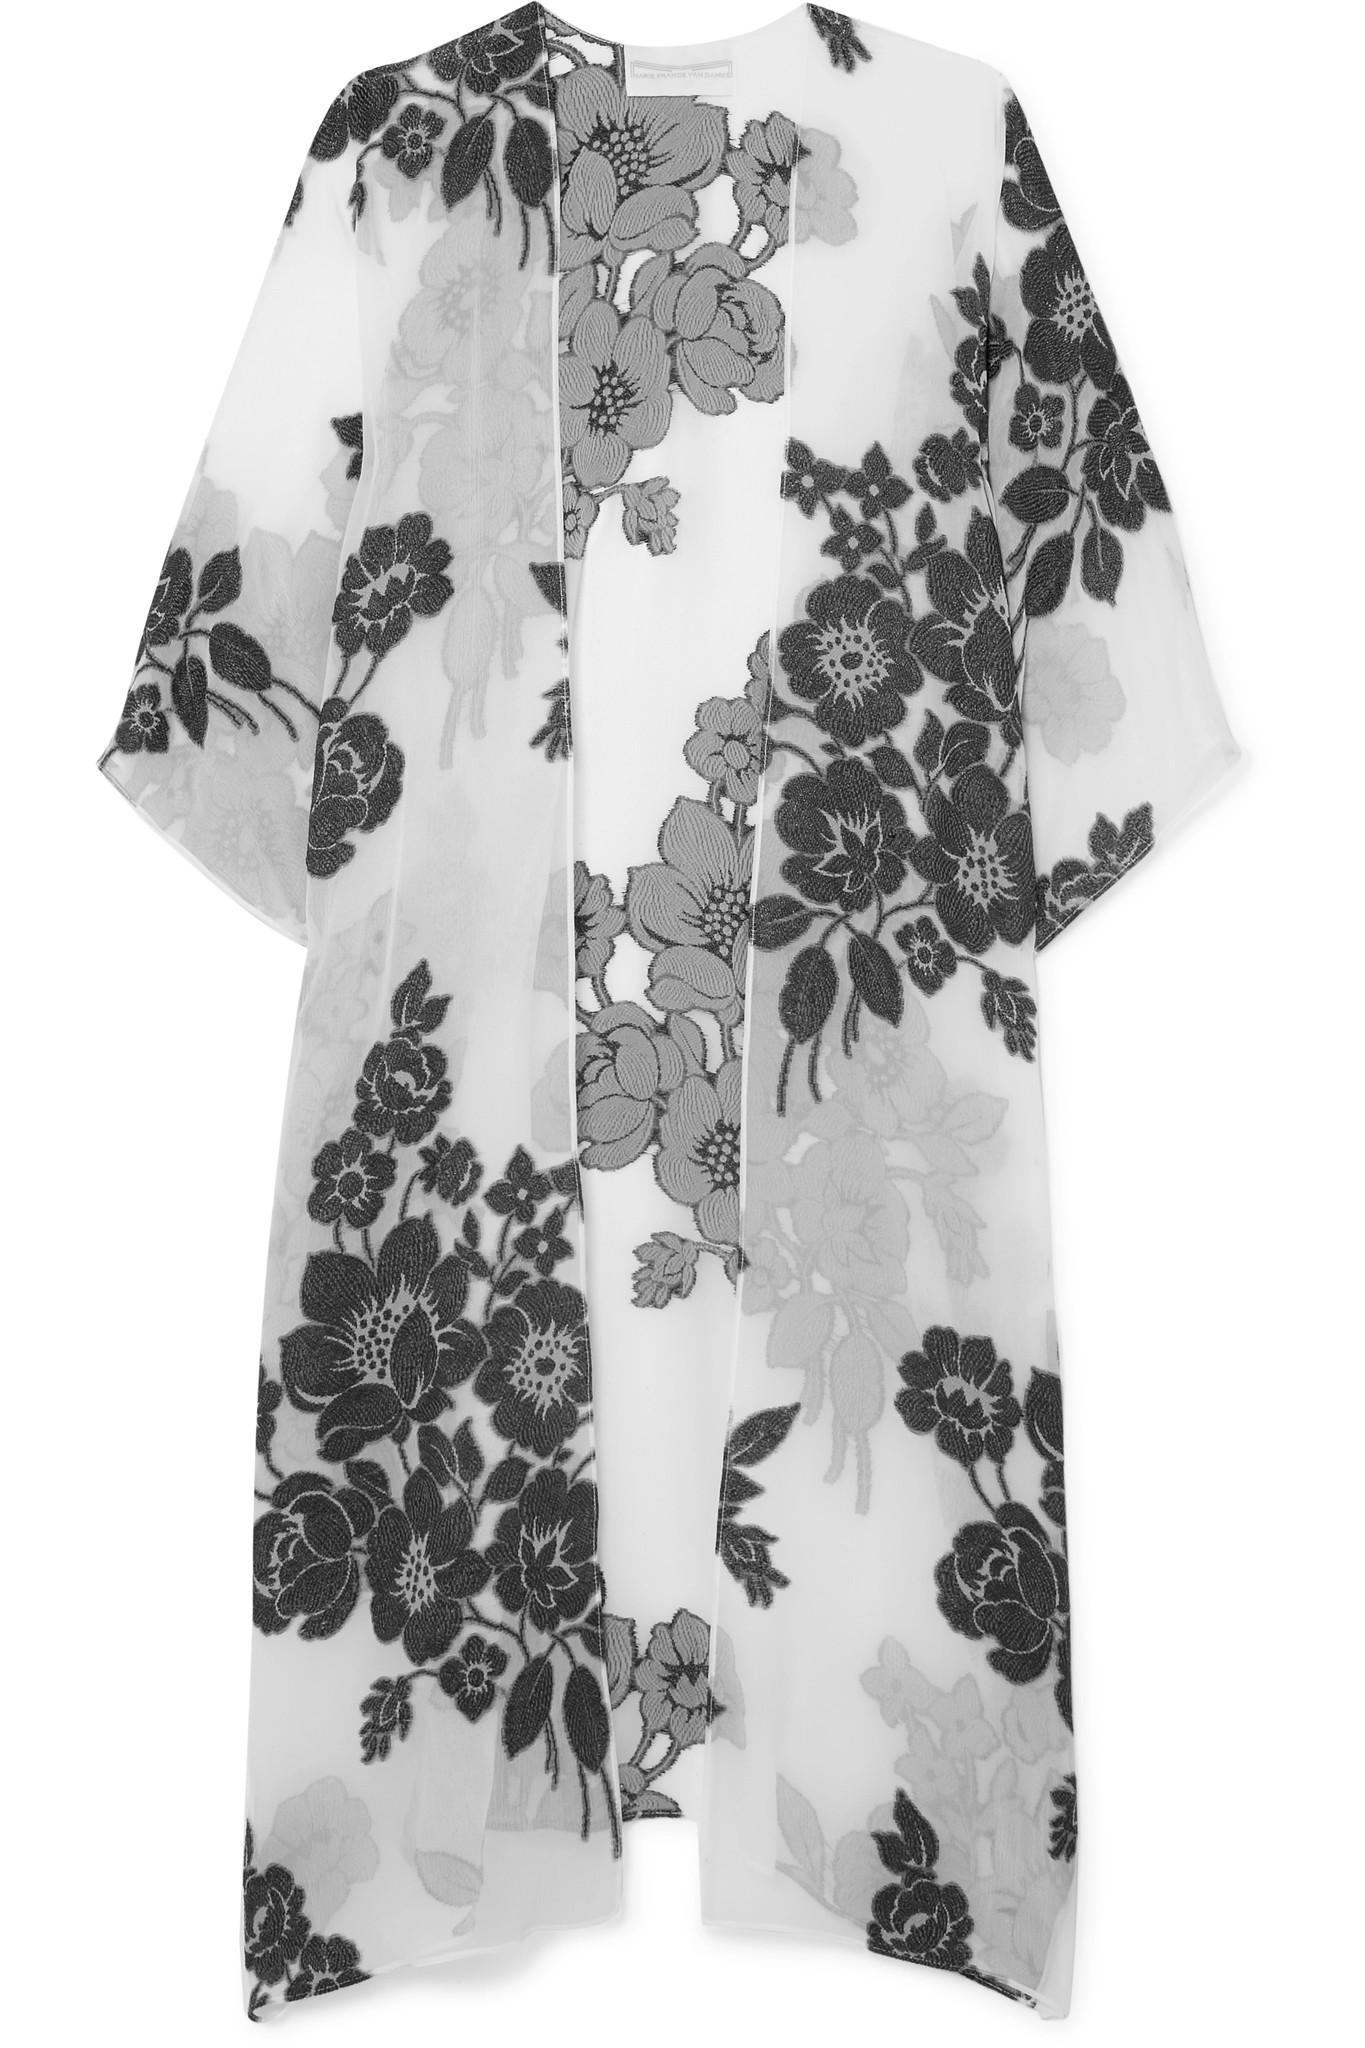 Metallic Floral Silk-blend Jacquard Maxi Dress - White Marie France Van Damme Clearance Original Clearance Very Cheap YWQOuTmCcI